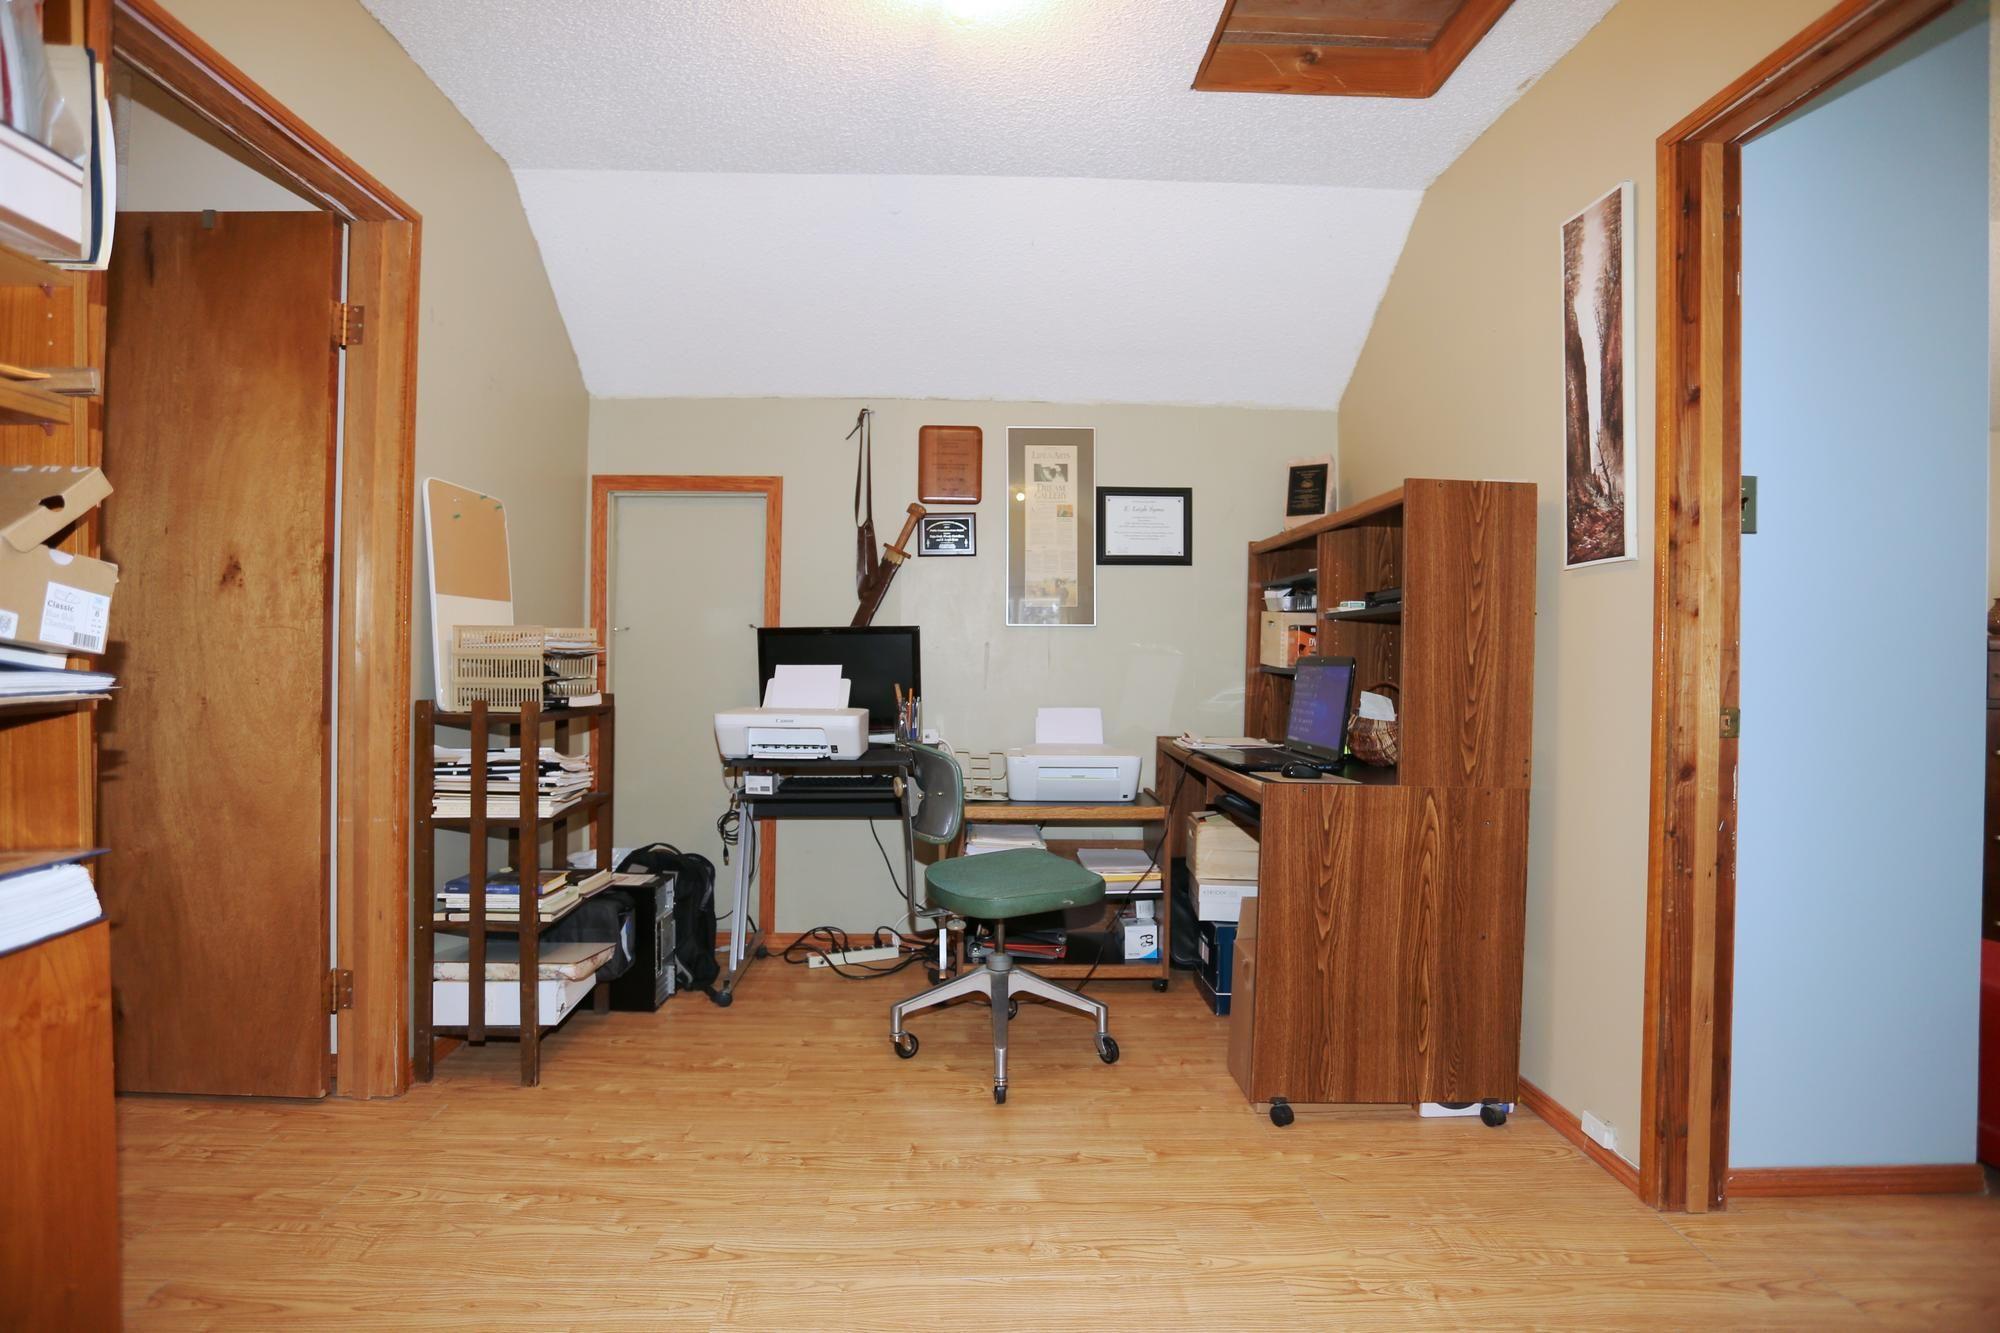 Photo 22: Photos: 109 Garfield Street South in Winnipeg: Wolseley Single Family Detached for sale (5B)  : MLS®# 1808340